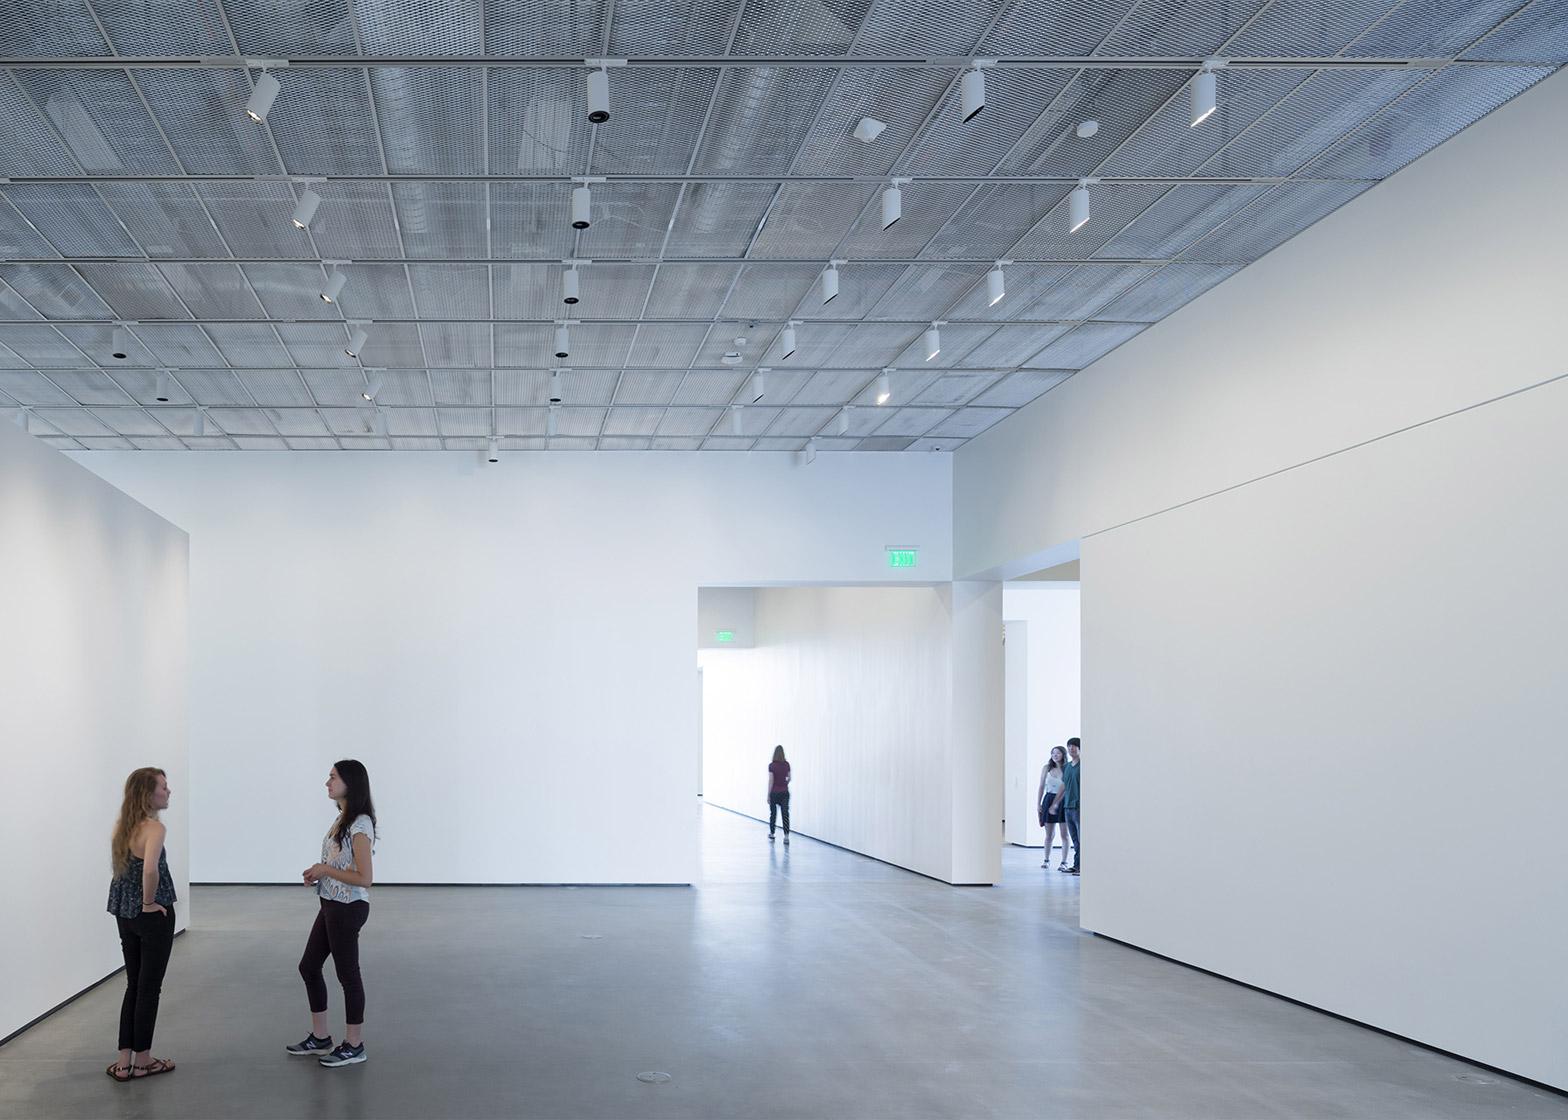 The Manetti-Shrem Museum by SO-IL and Bohlin Cywinski Jackson